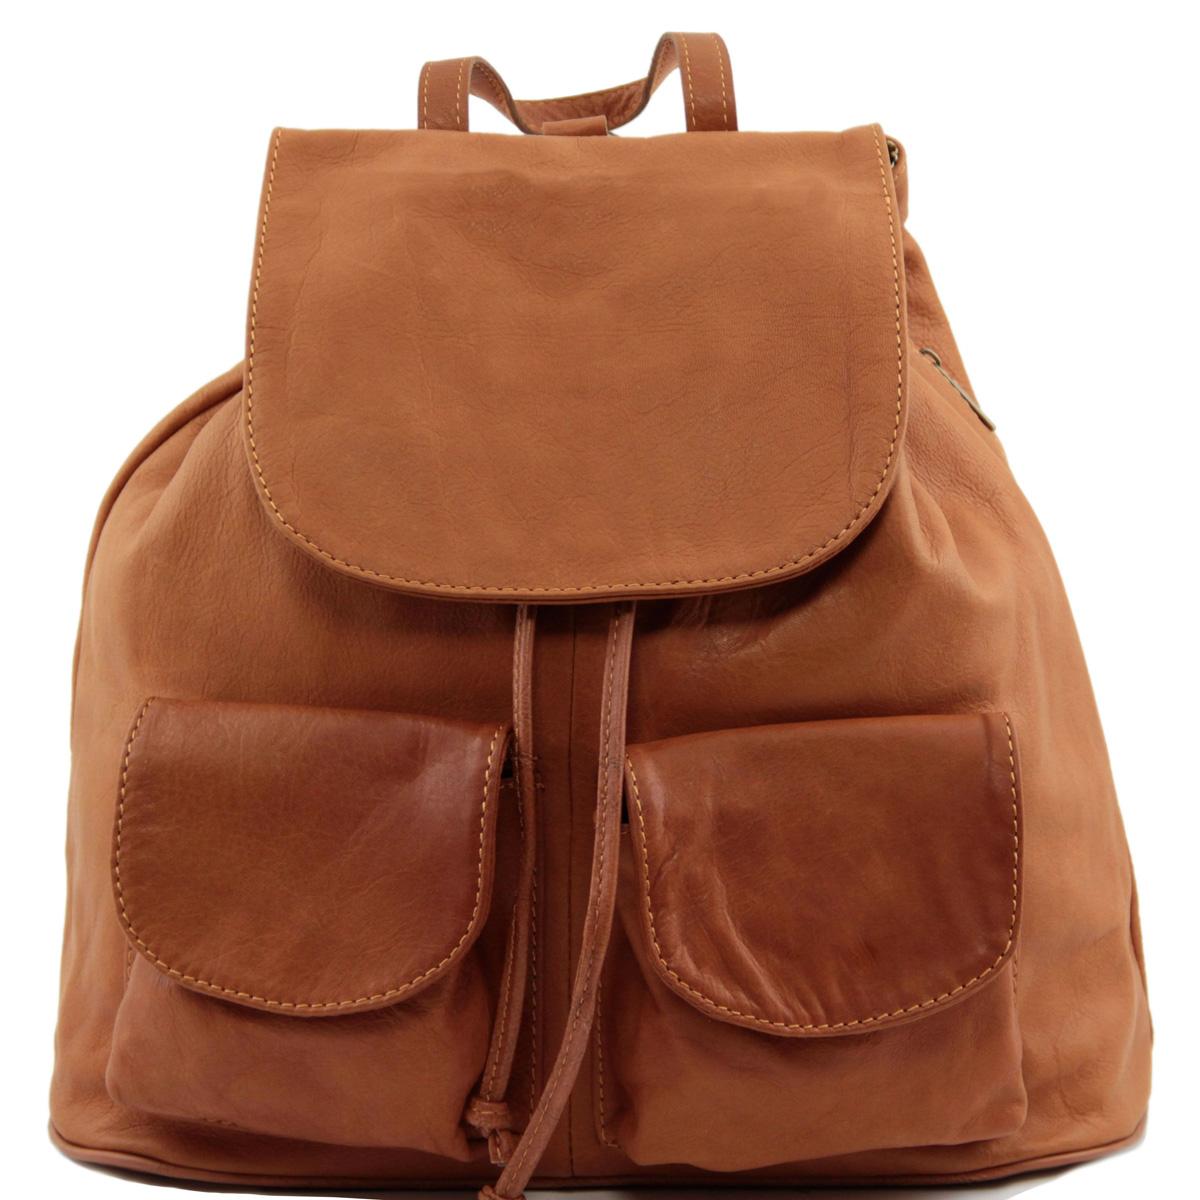 Bric s X Travel large backpack BXL44660 - ITALIENSKA VÄSKBUTIKEN 966e1dfd88368